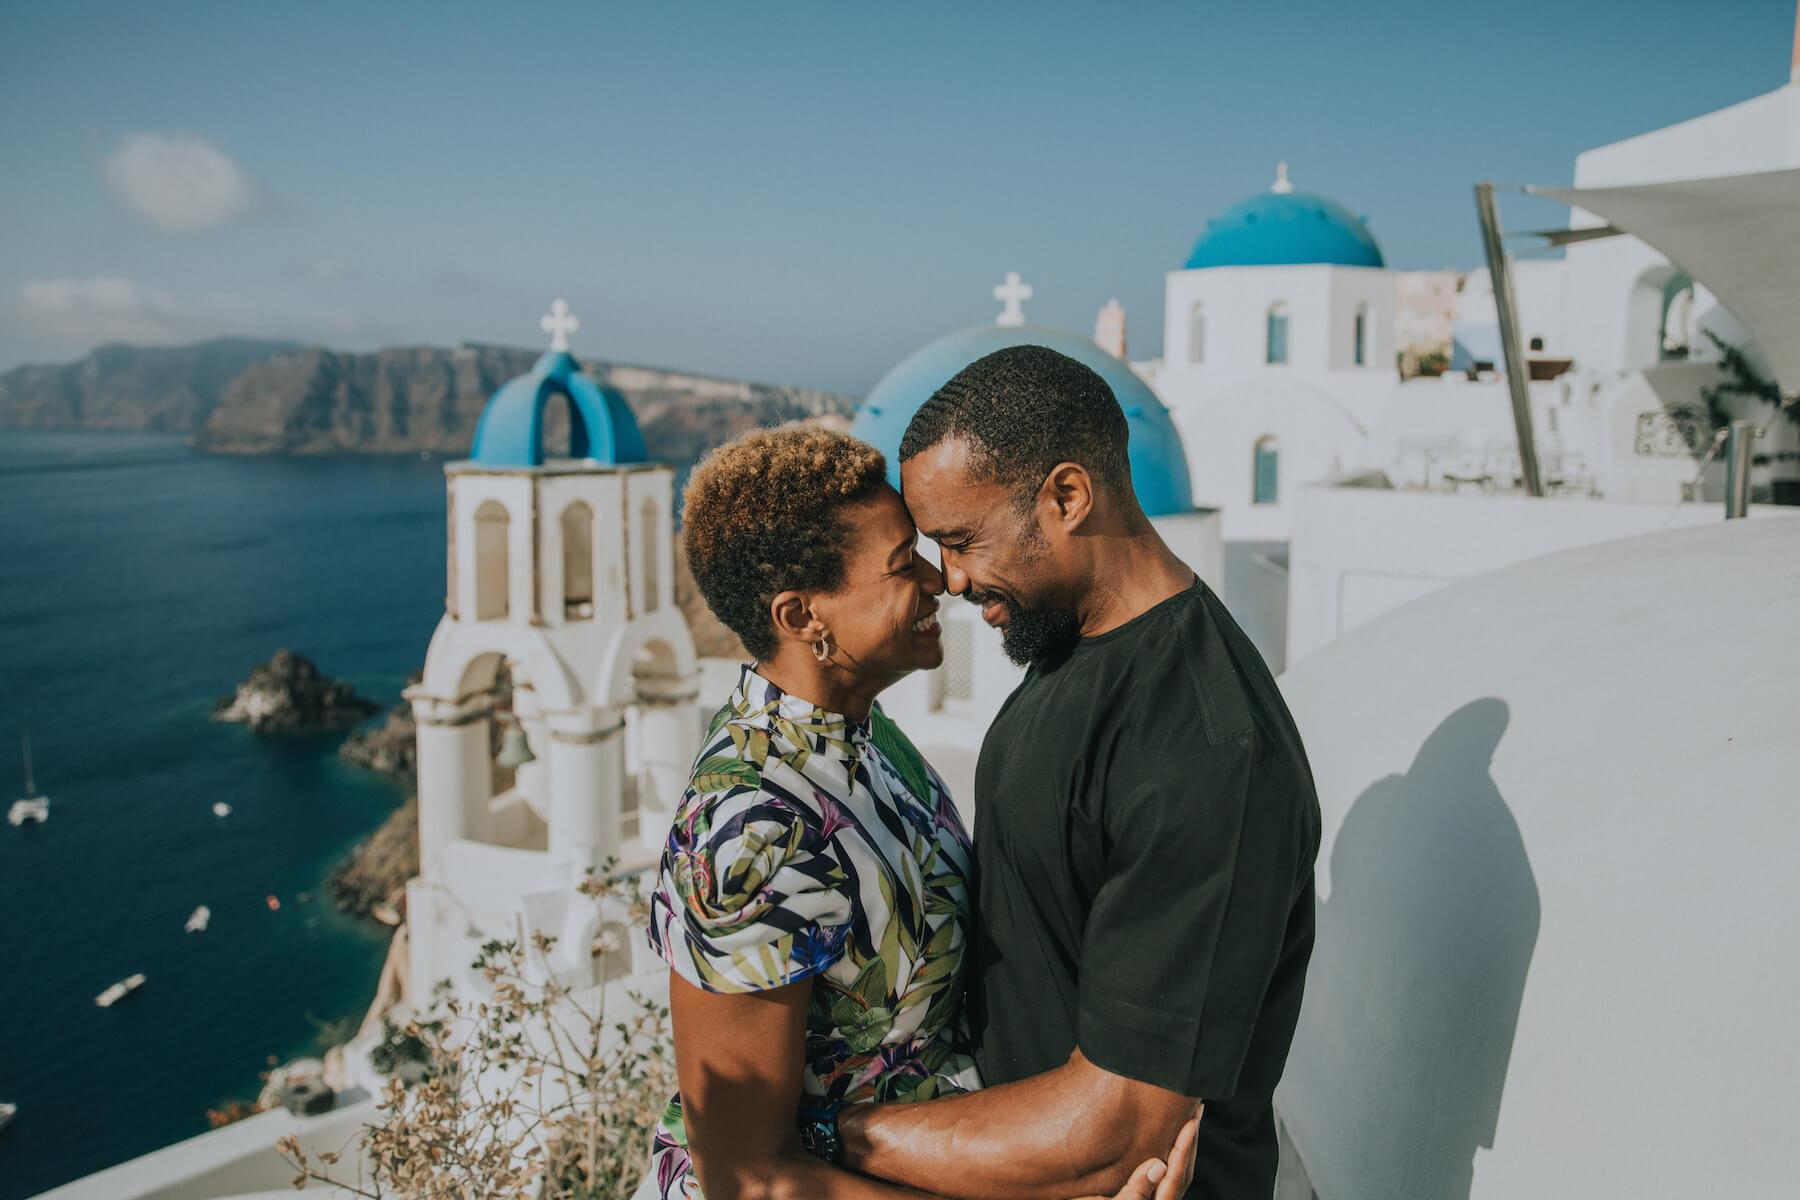 santorini-09-24-2019-couples-trip-8_original